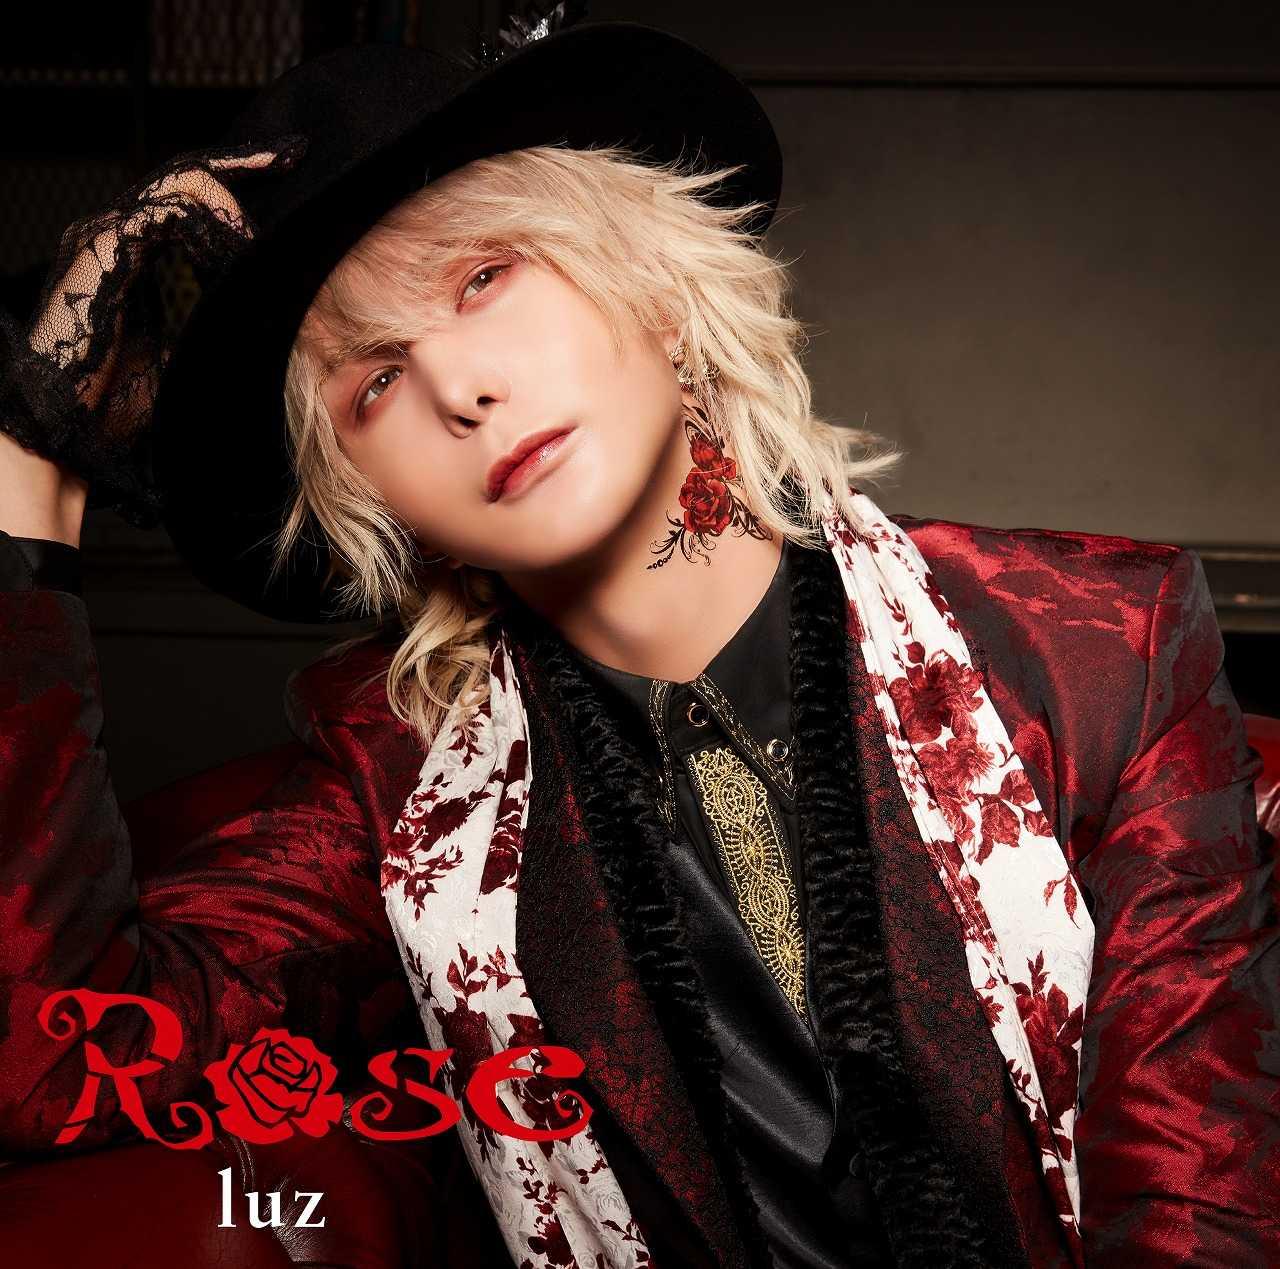 luz 2nd Single『Rose』収録曲「アイビーラスト feat.oscuro」MV公開